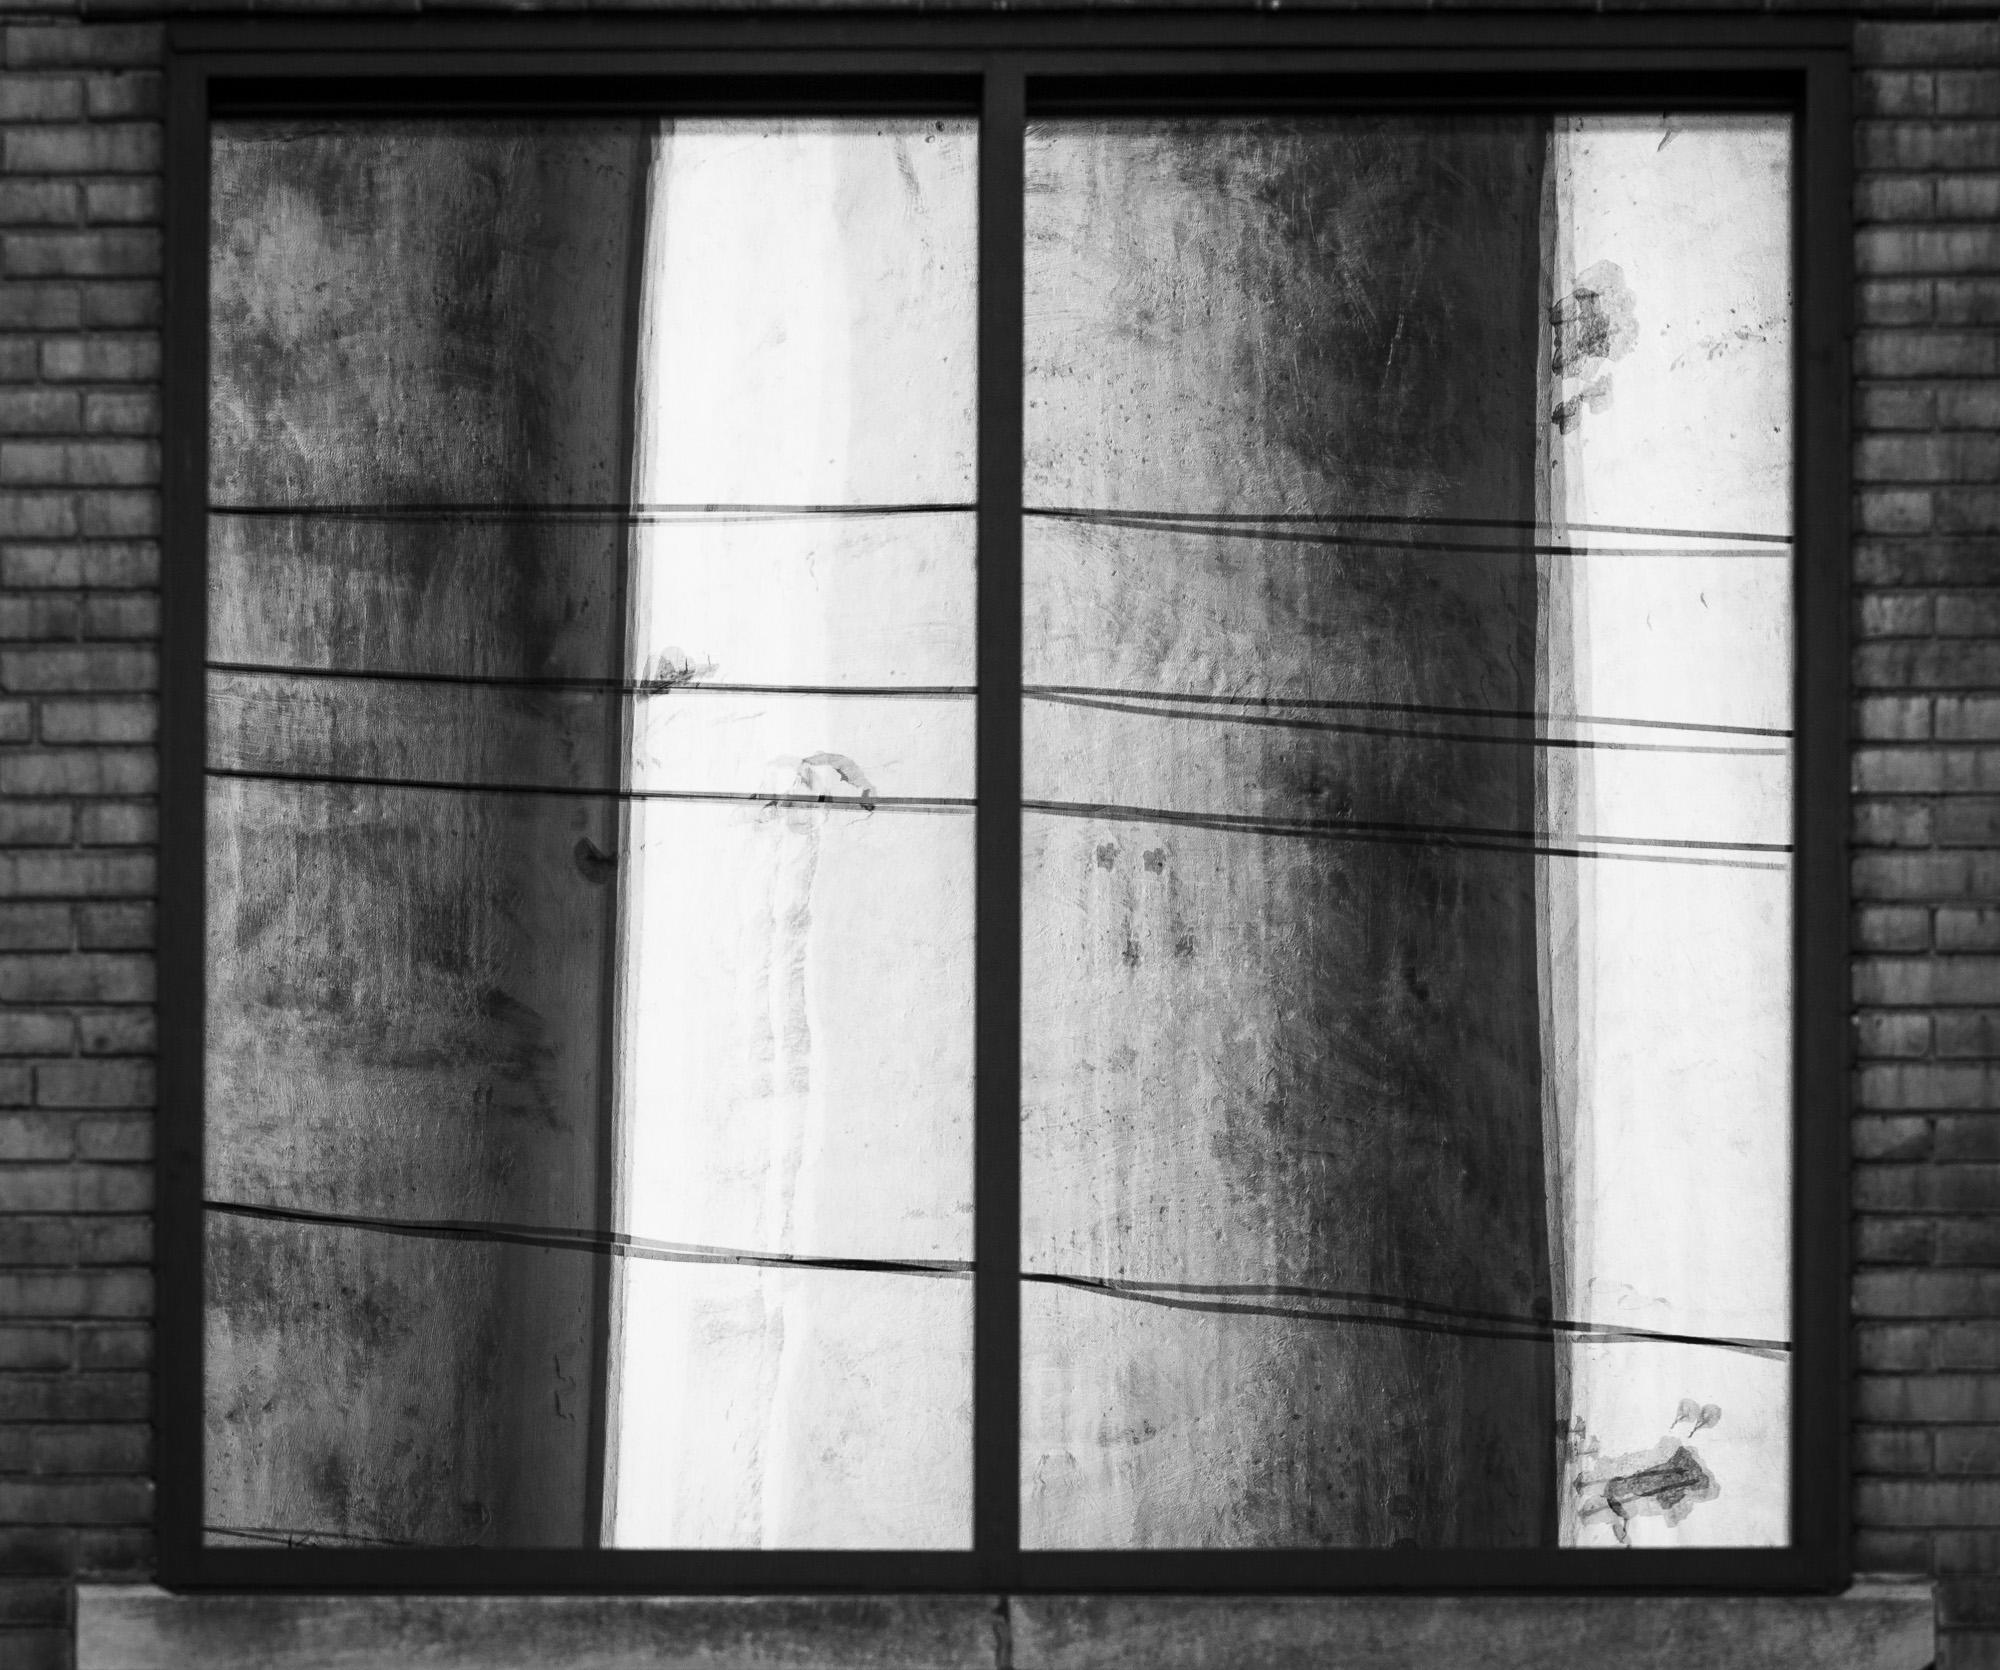 © Mark Maio Early MOrning Reflection.jpg